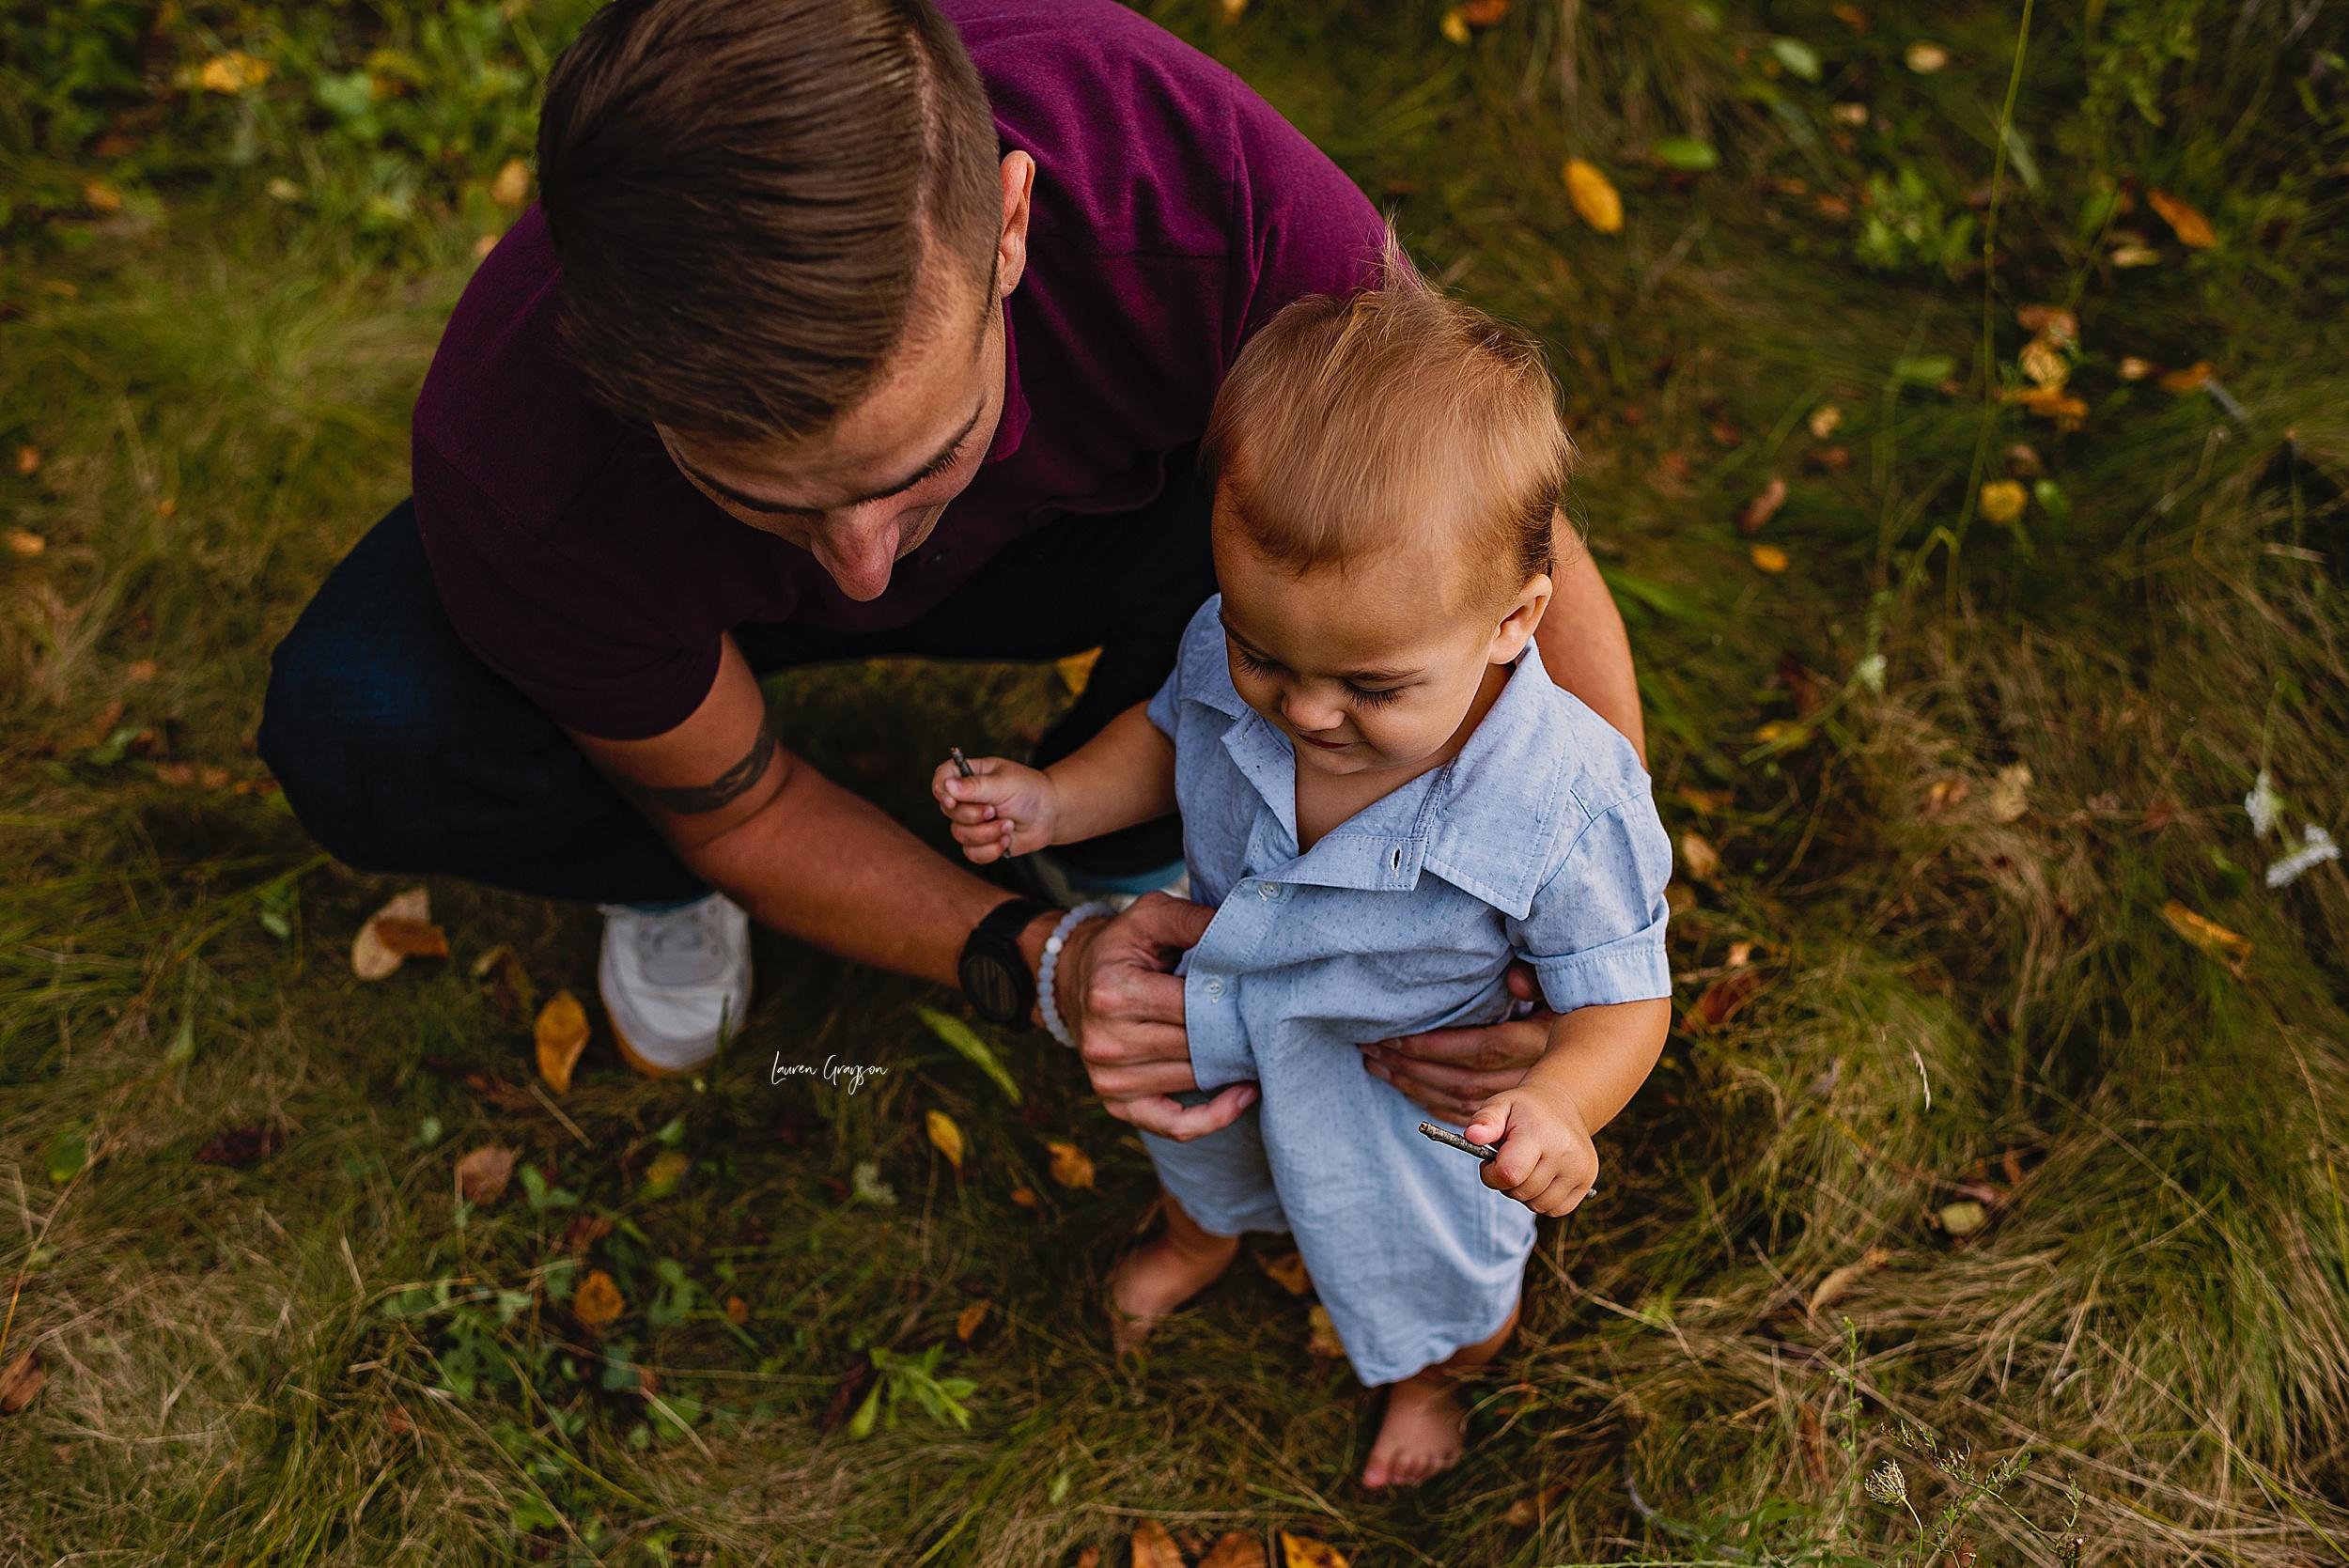 lauren-grayson-photography-cleveland-ohio-photographer-AKRON-family-photos-springfield-bog-cullin-first-birthday_0812.jpg